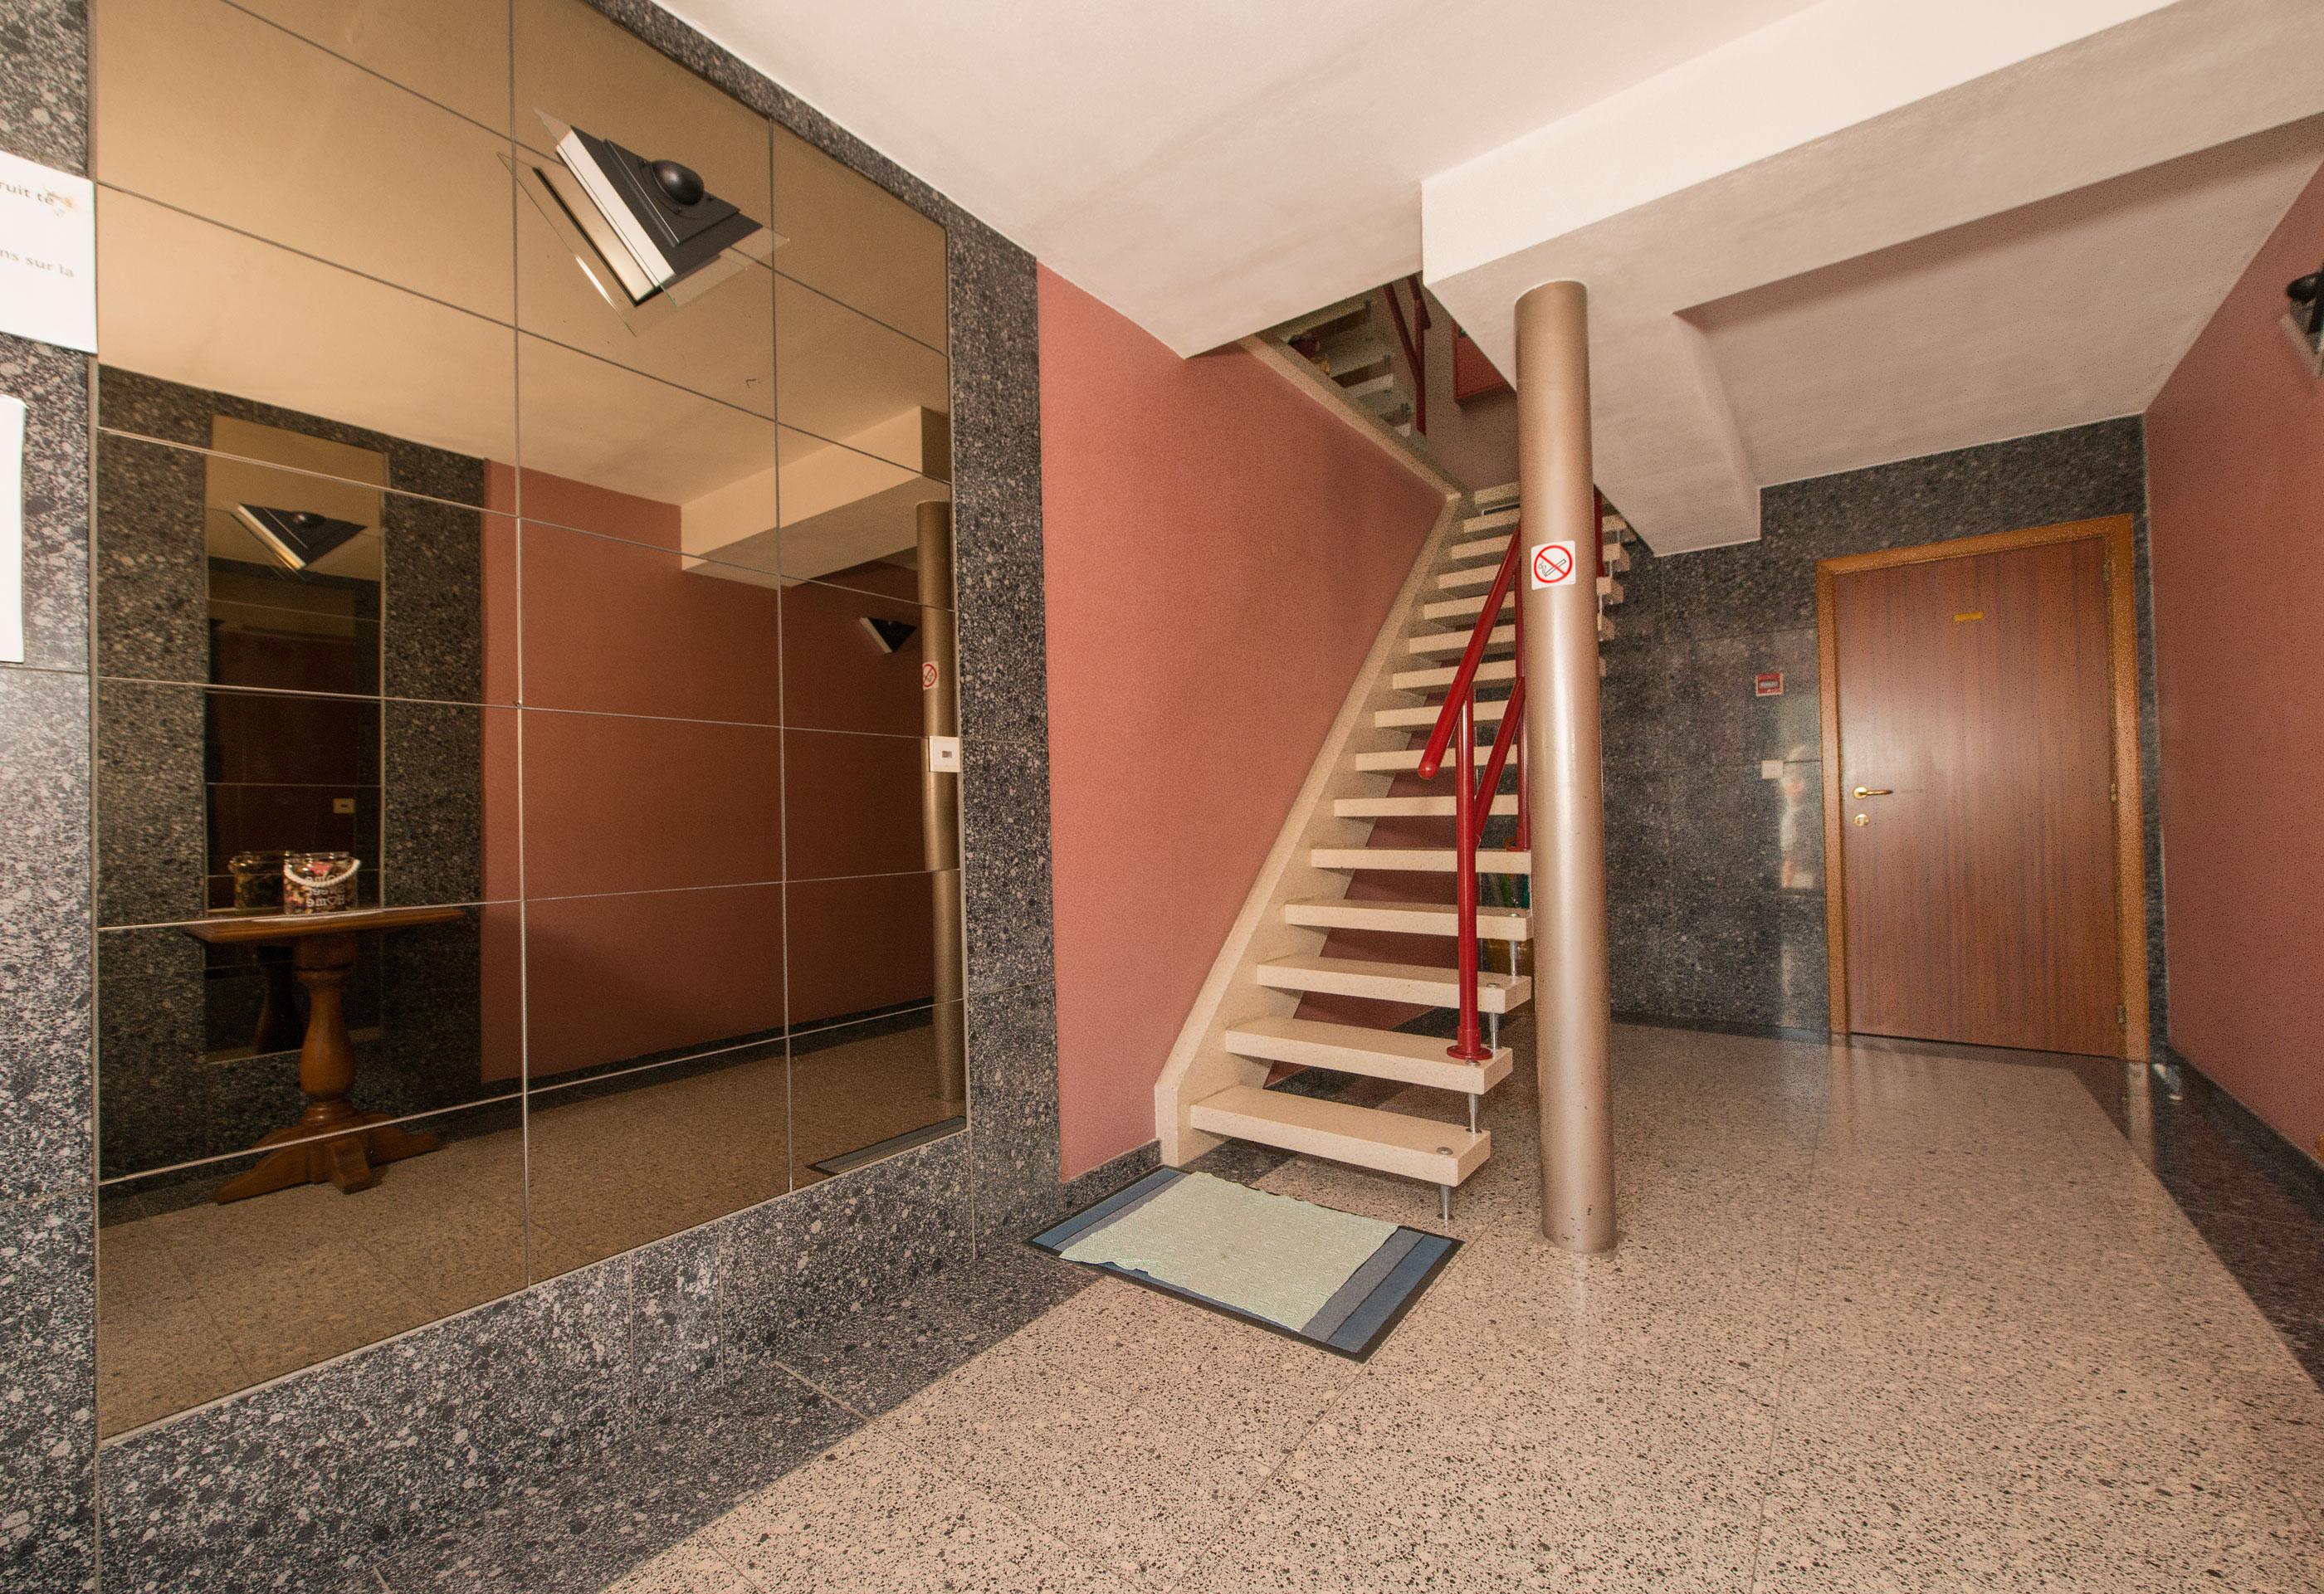 appartement halle a vendre nos offres immobili re berth. Black Bedroom Furniture Sets. Home Design Ideas